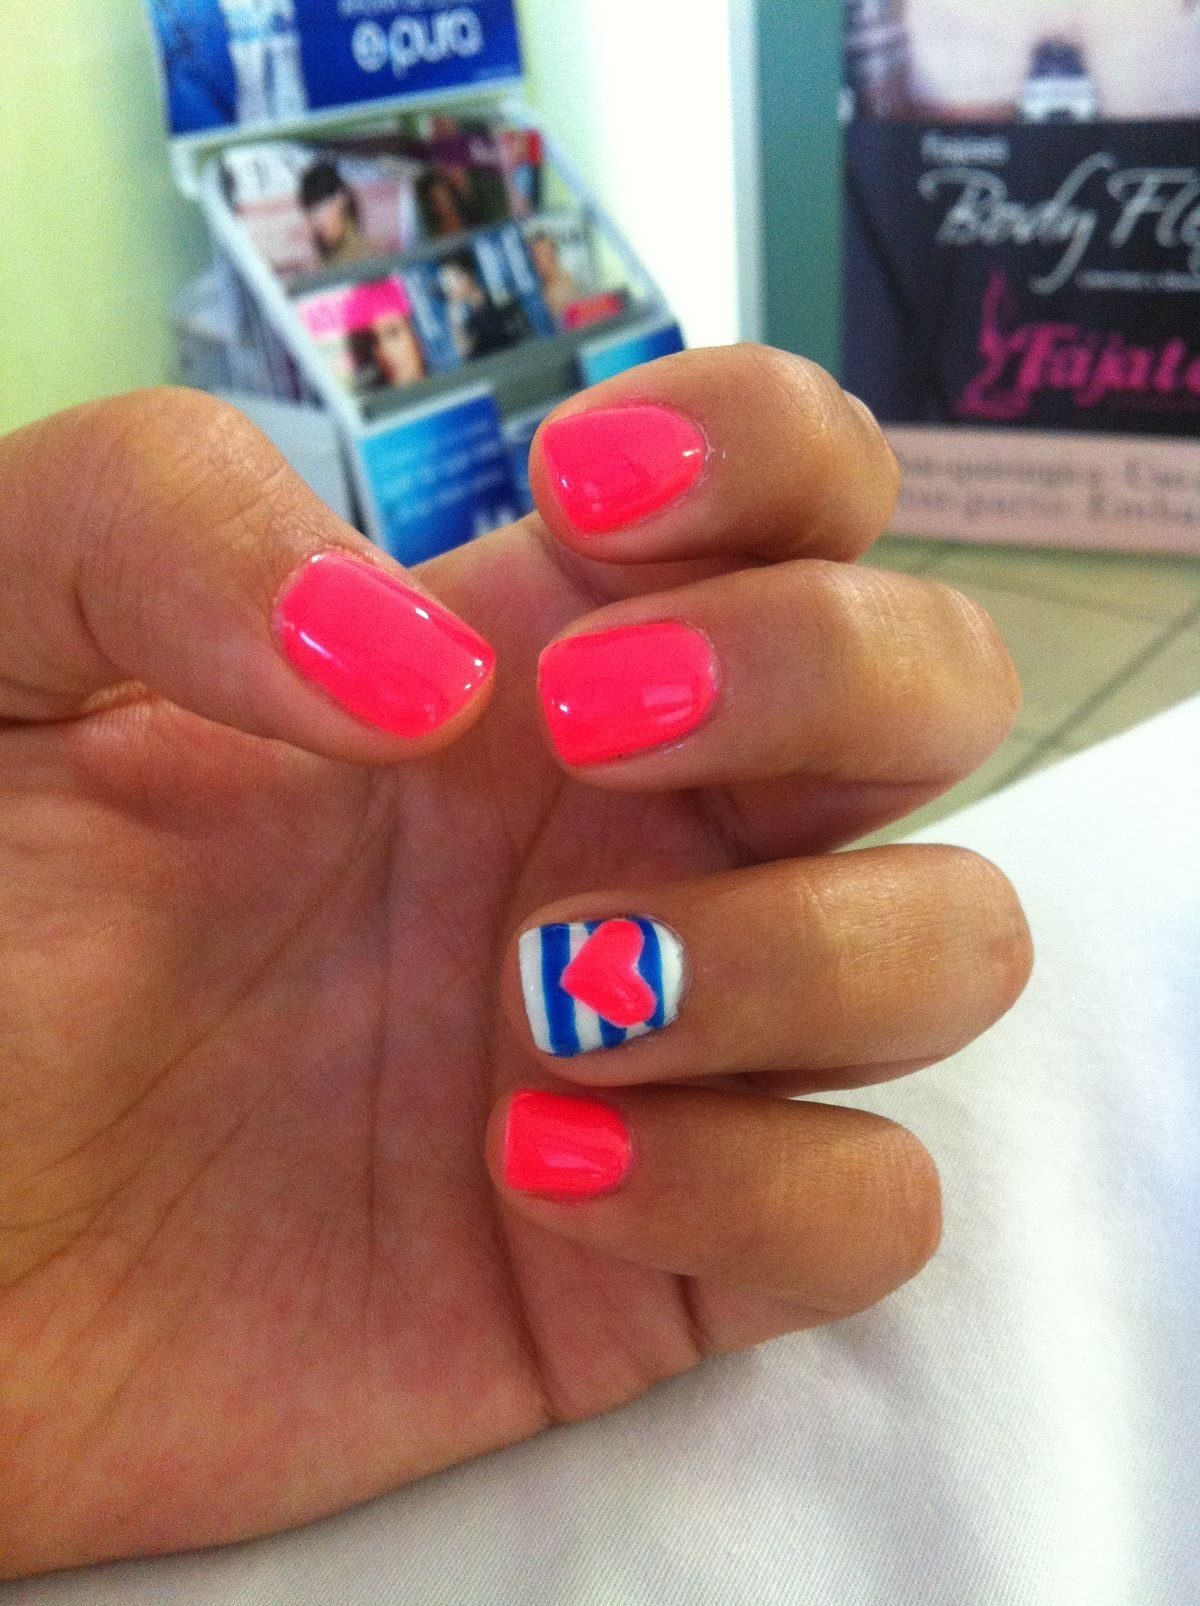 Nail designs | Crafts I would like to try | Pinterest | Nail nail ...